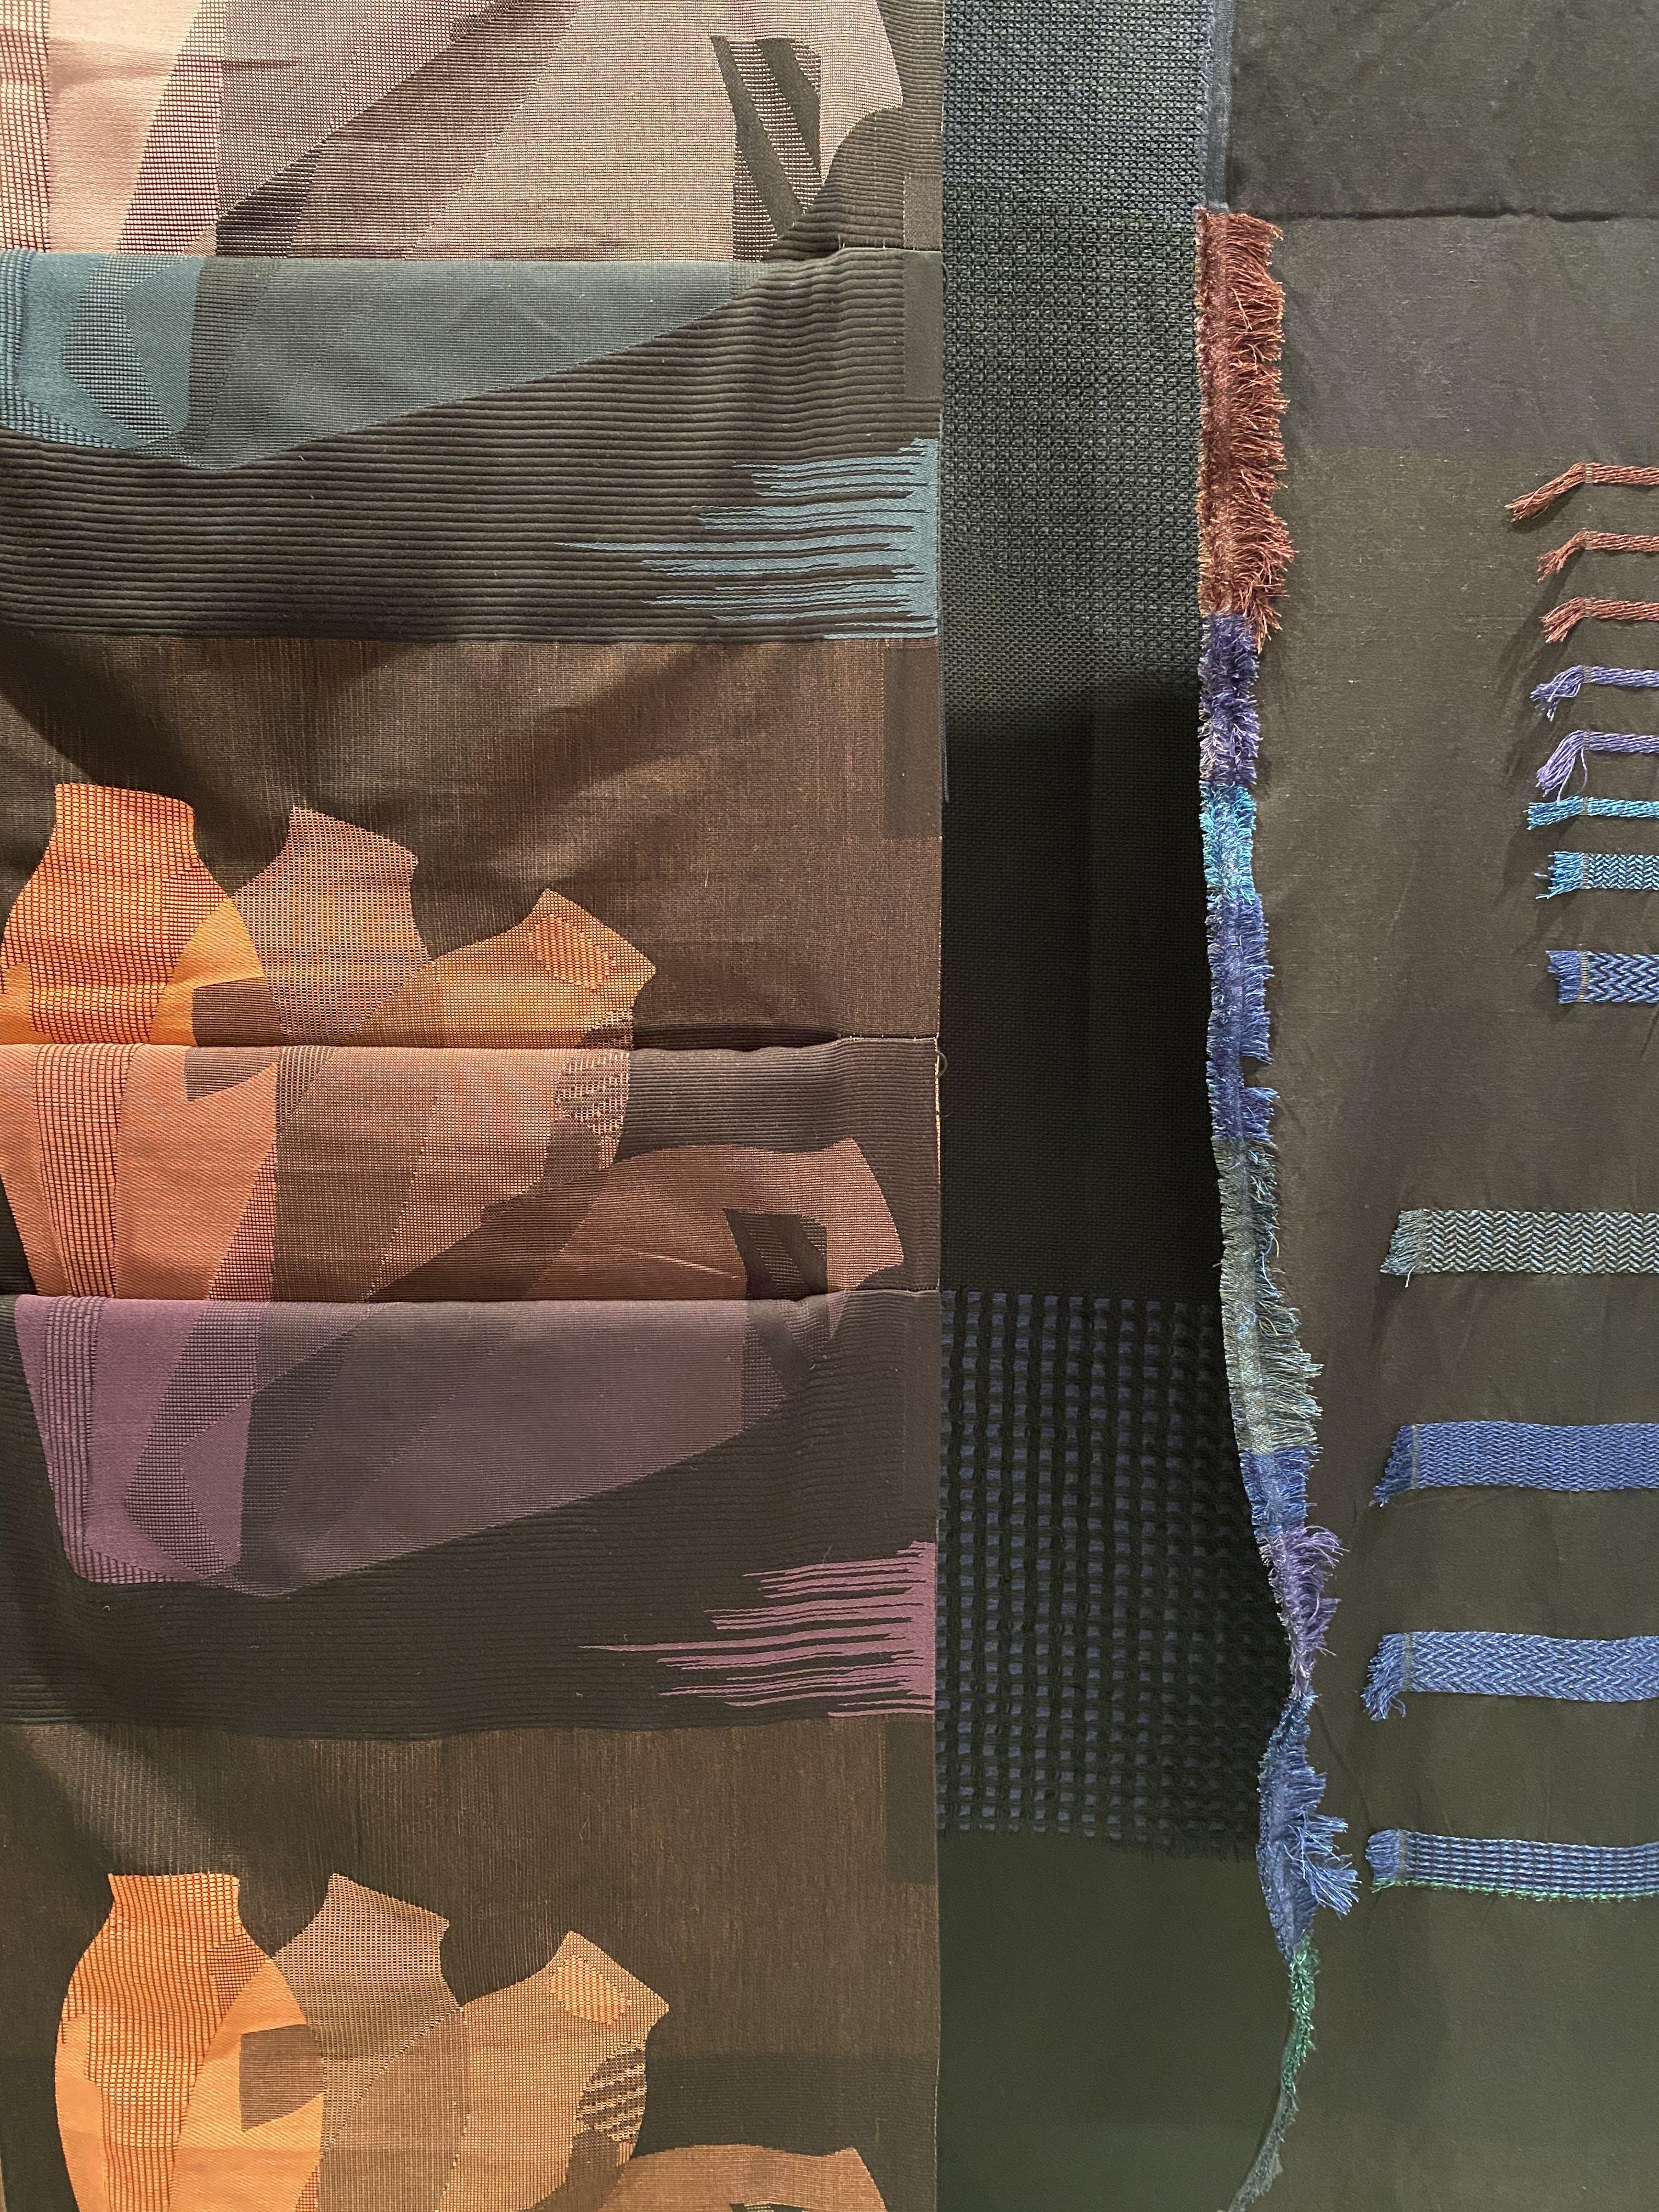 HELLA JONGERIUS - COLOURFUL BLACK INSTALLATION - 2017/2010 - Colors, etc. LILLE3000 au Tripostal.